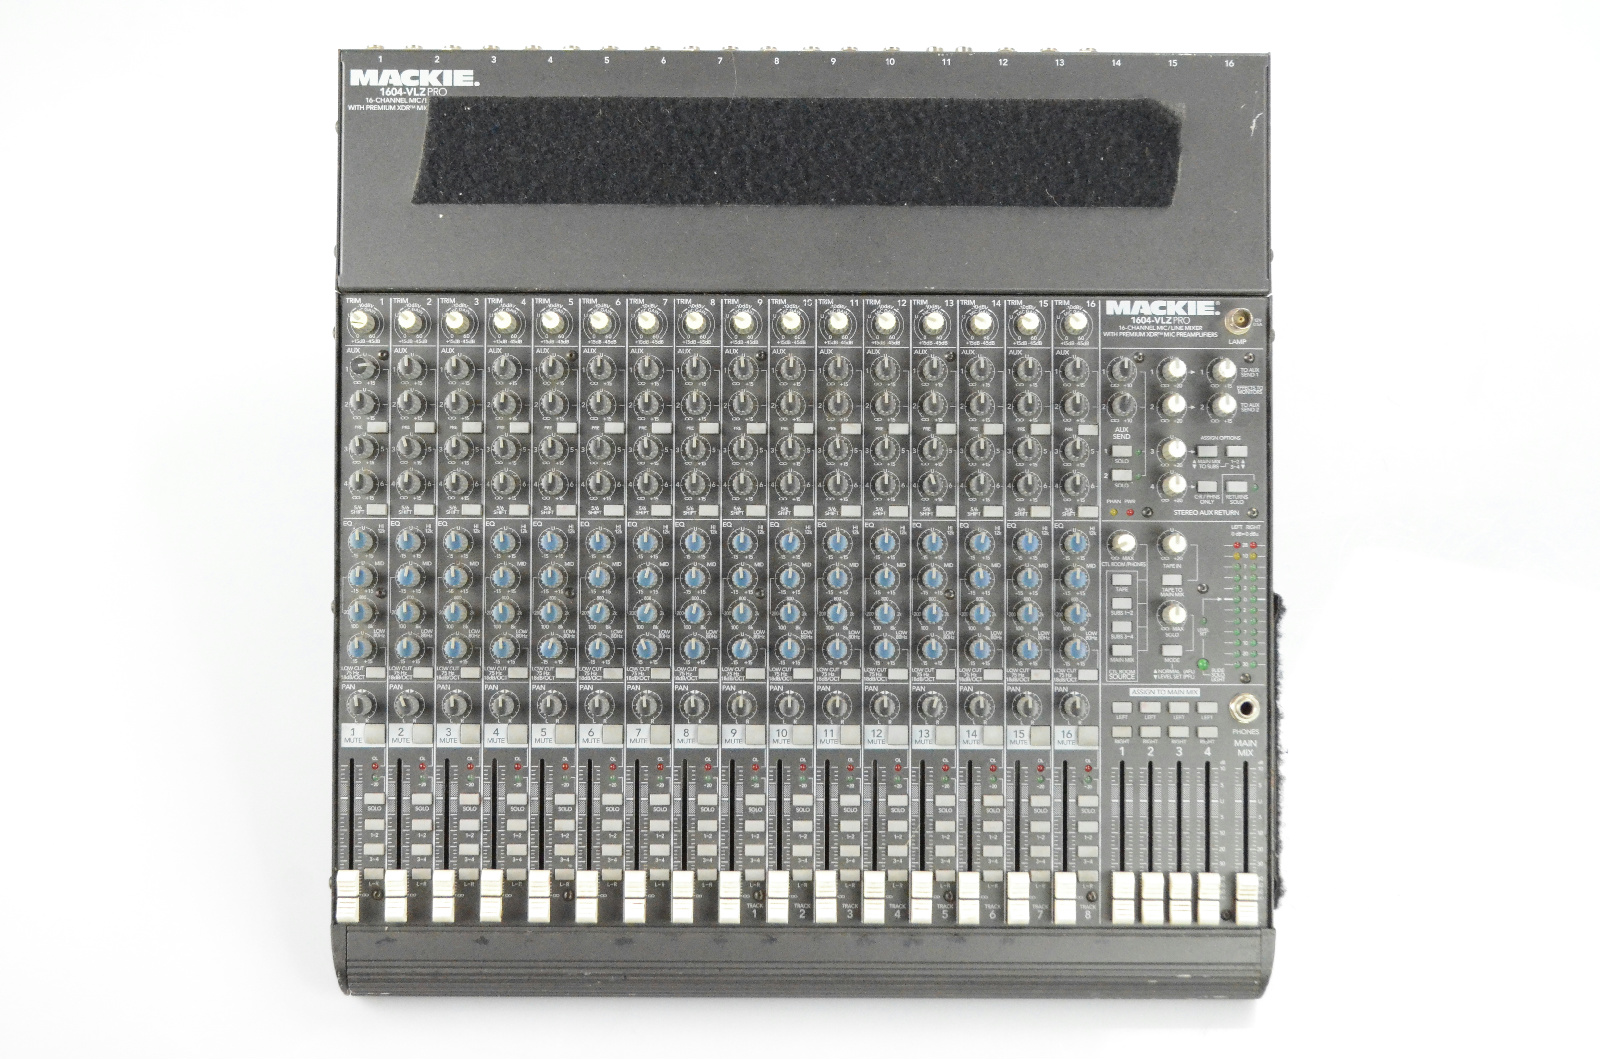 Mackie 1604-VLZ Pro 16 Channel Mixer #33409